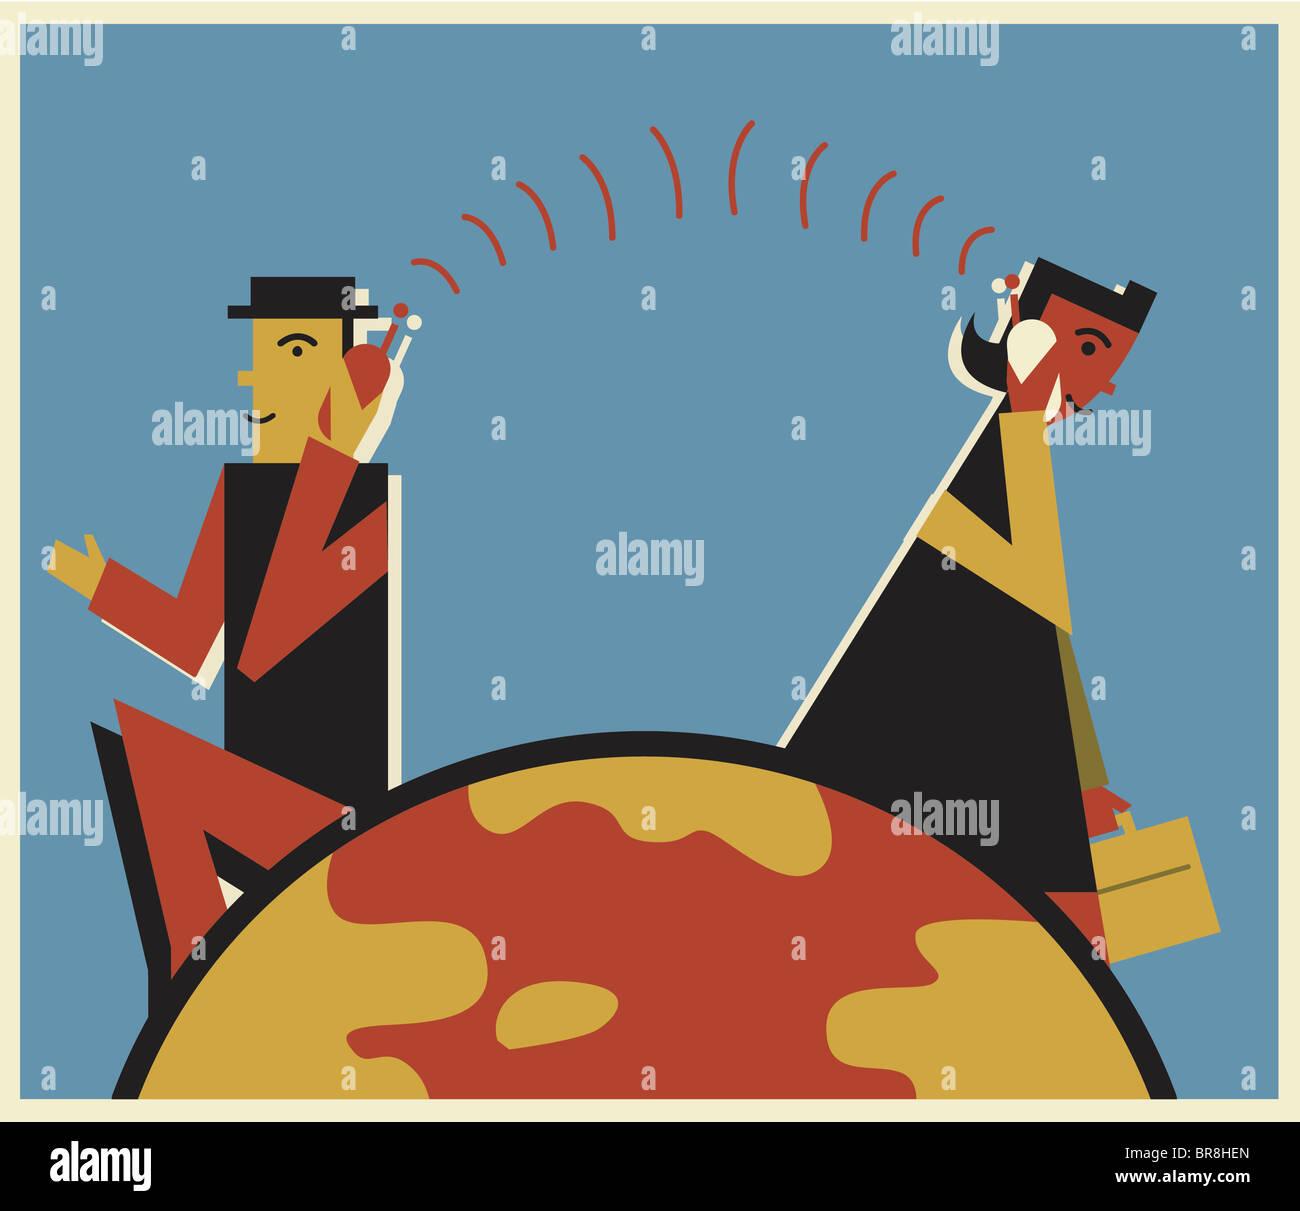 Dos profesionales hablando de larga distancia a teléfonos celulares Imagen De Stock